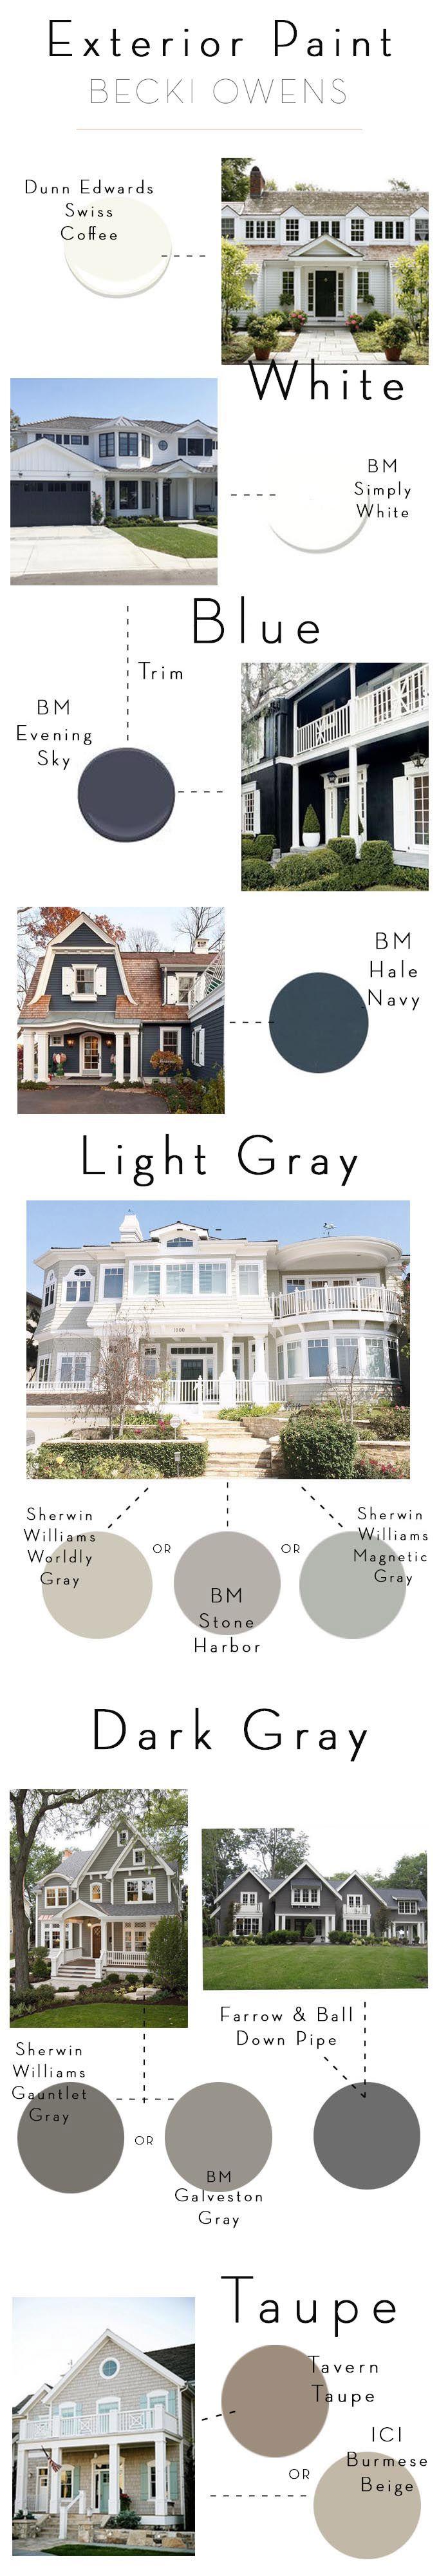 Choosing Exterior Paint Colors - Becki Owens